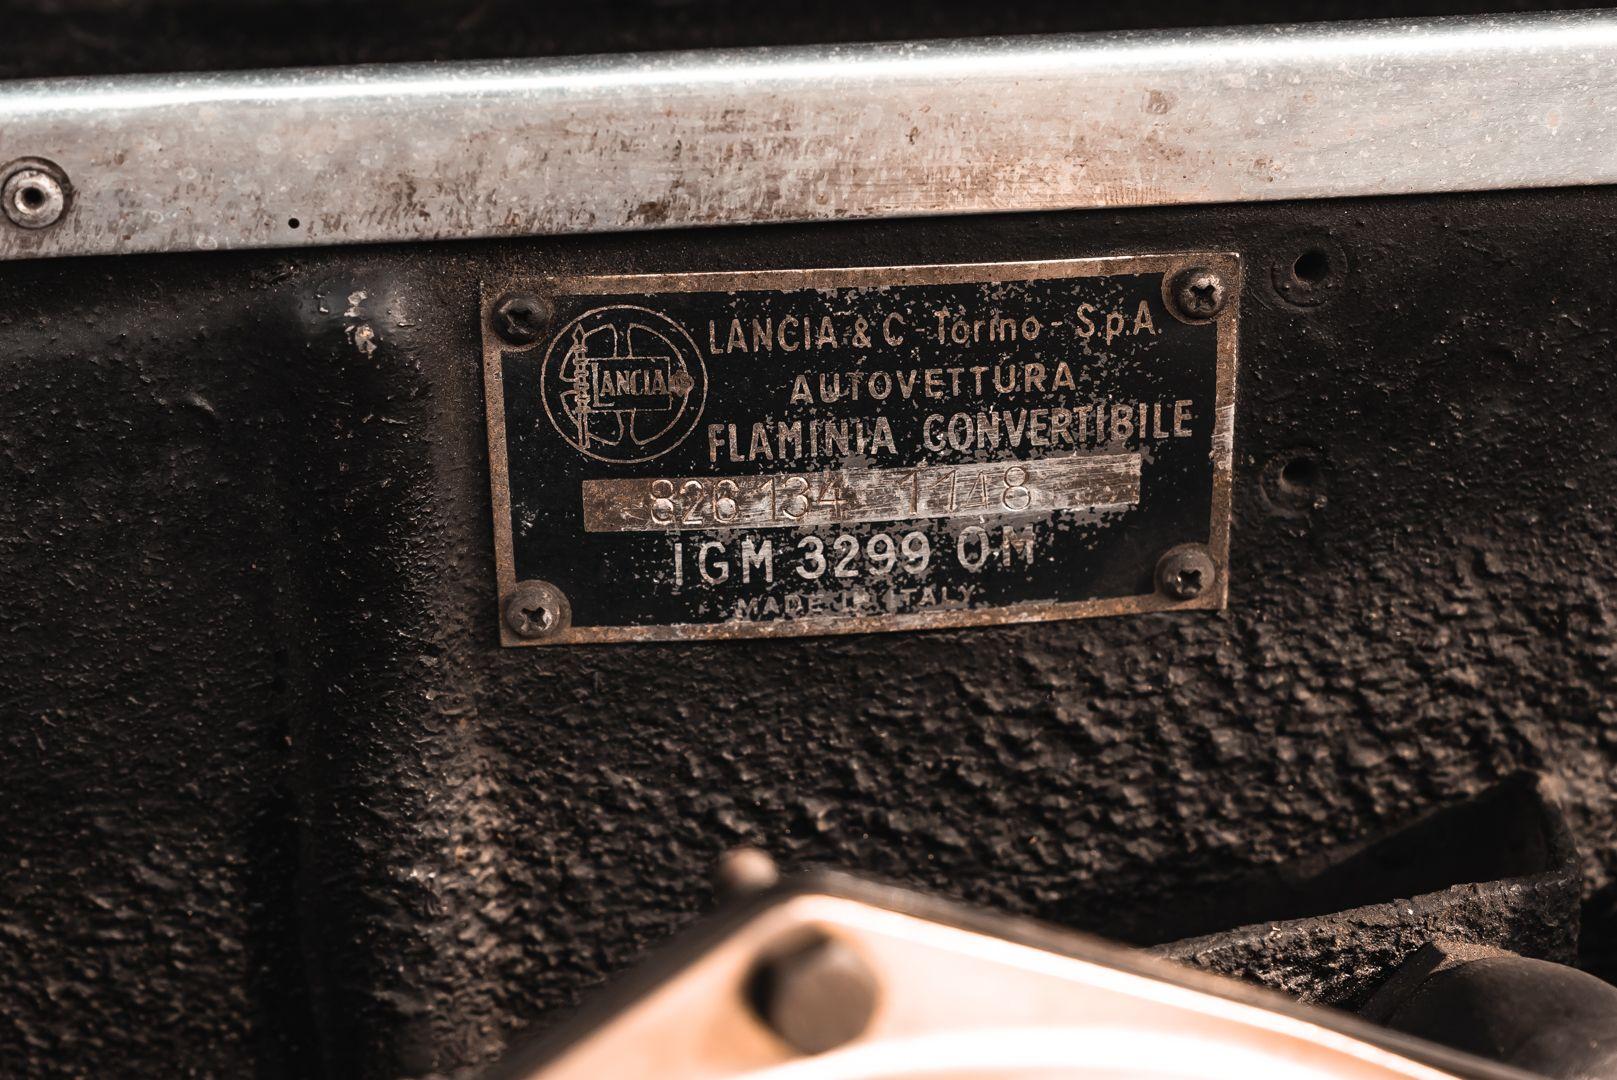 1968 Lancia Flaminia Touring Convertible 2800 3C 79162